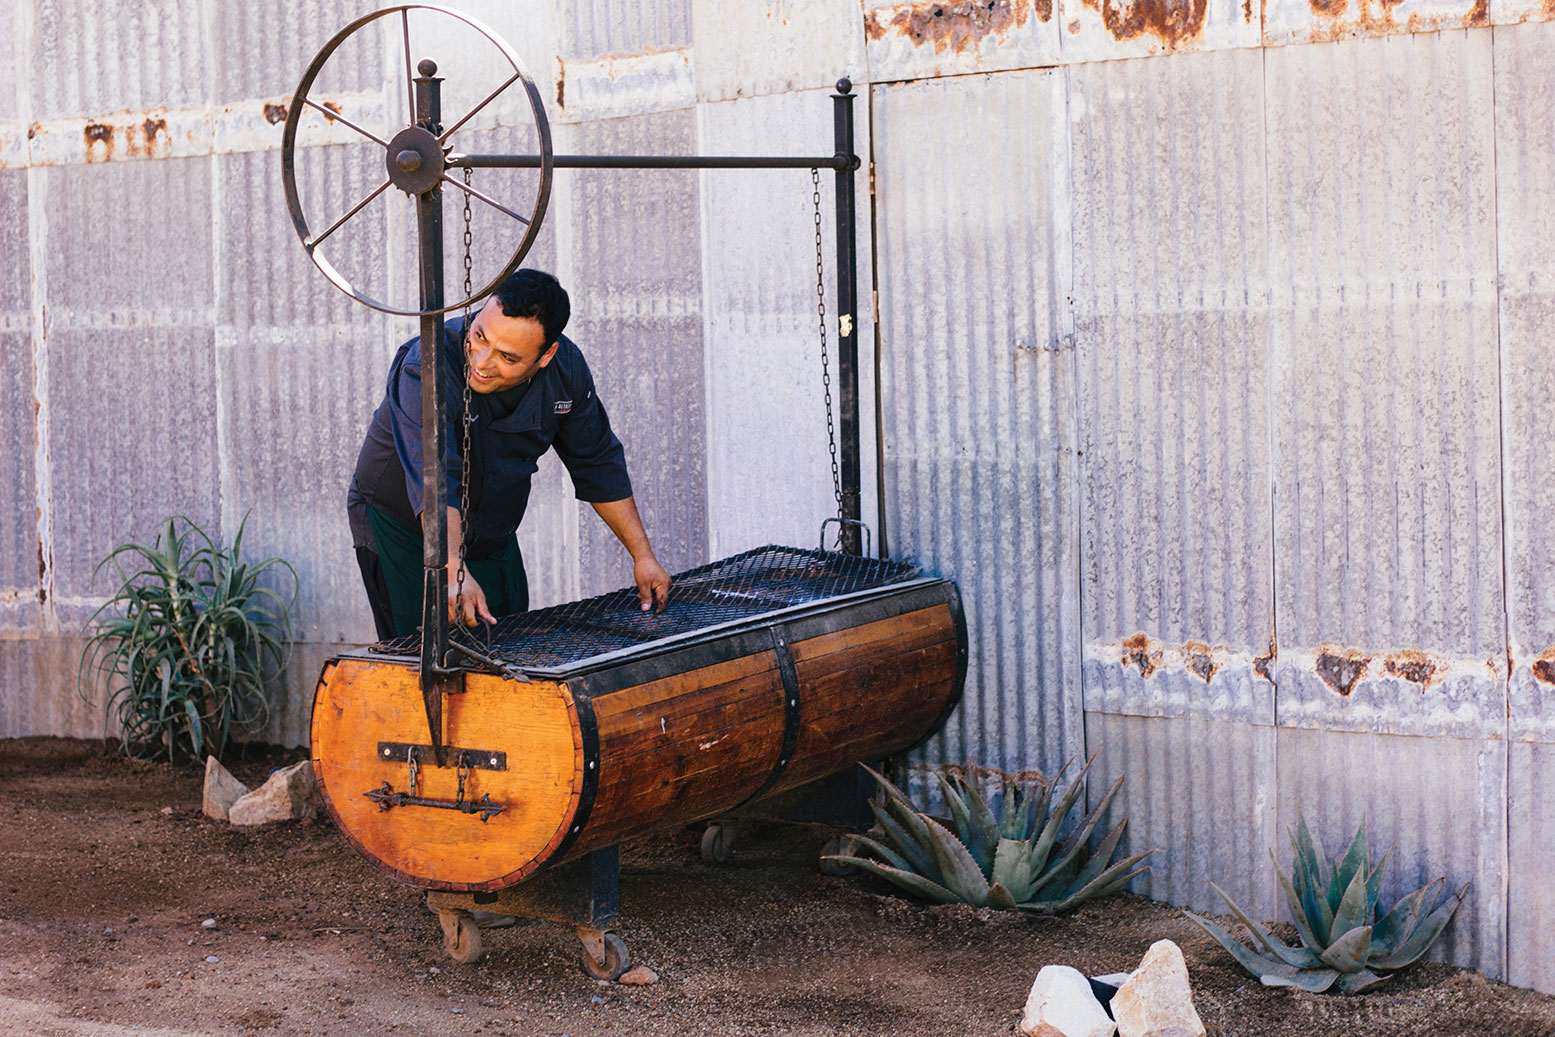 Finca Altozano Pedro Penuelas Peñuelas lamb valle de guadalupe caja china roasting box mexico baja travel